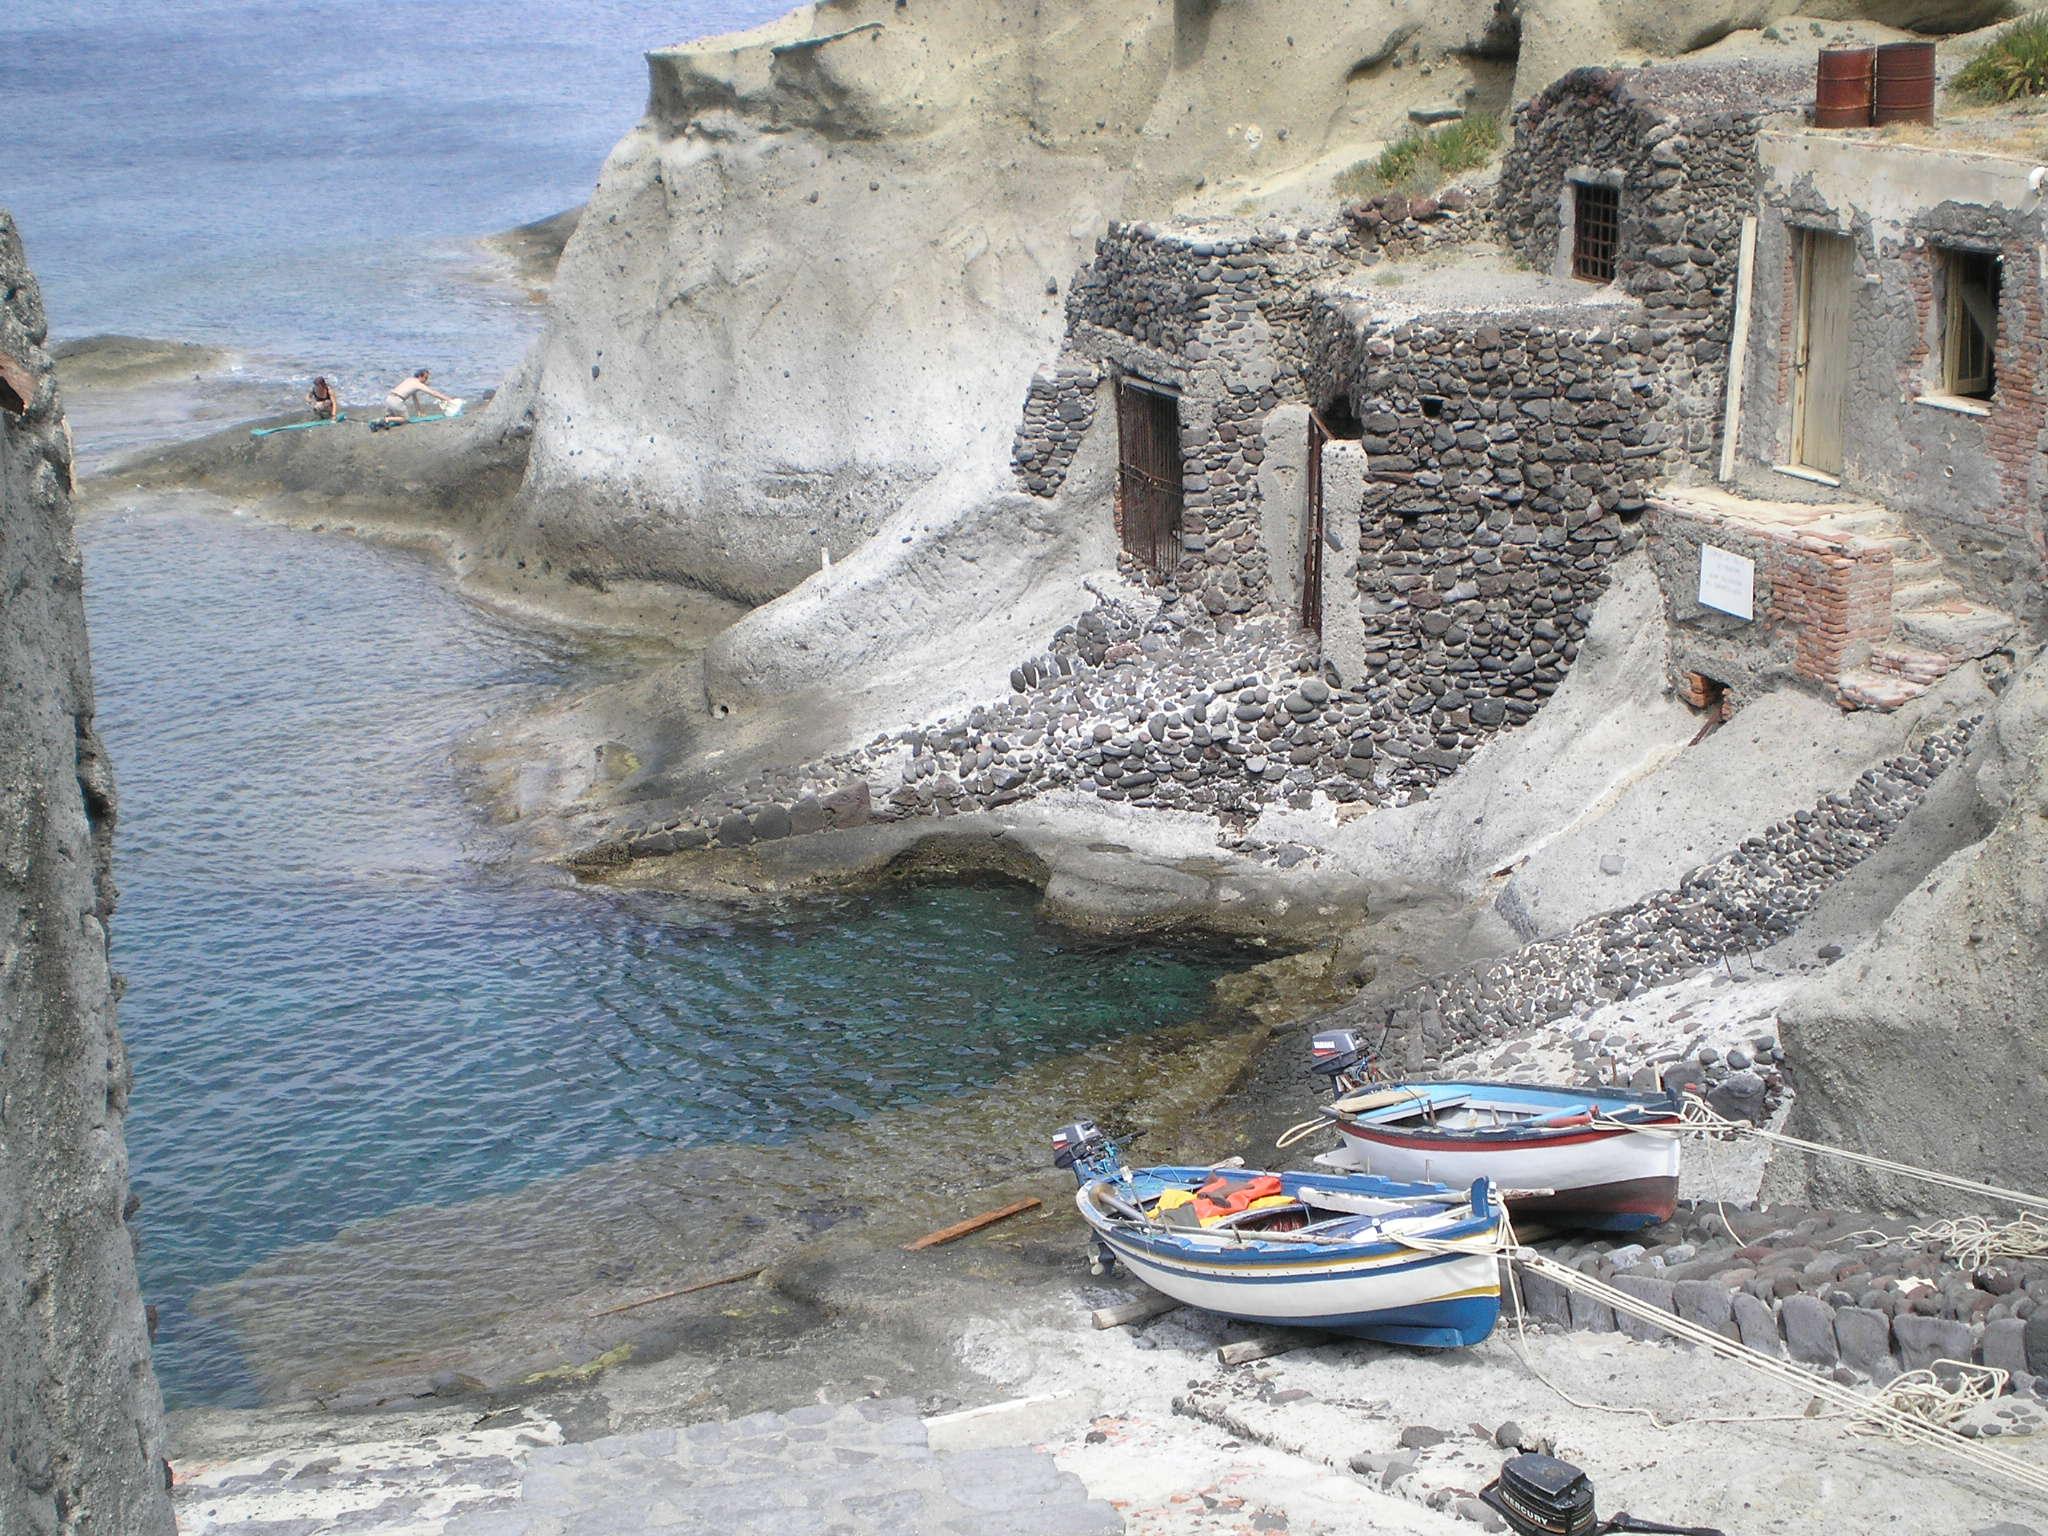 http://www.viaggiavventurenelmondo.it/immagini/eolietrek.JPG